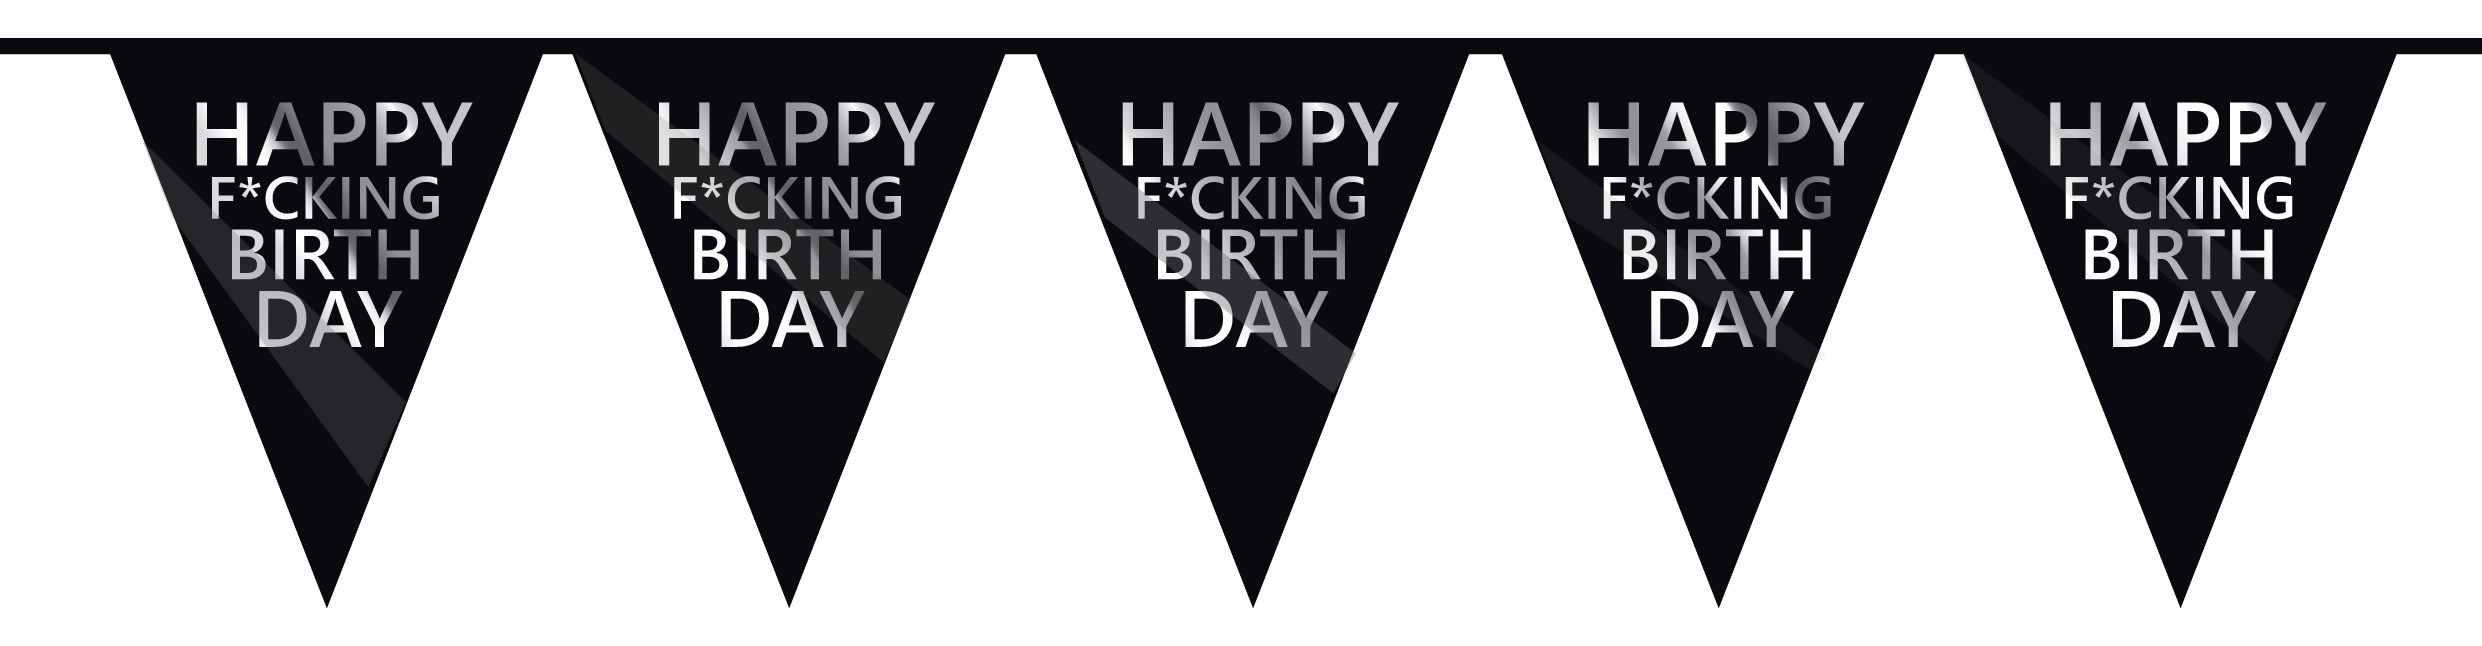 Vlaggenlijn zilver/zwart 6m happy f*cking birthday